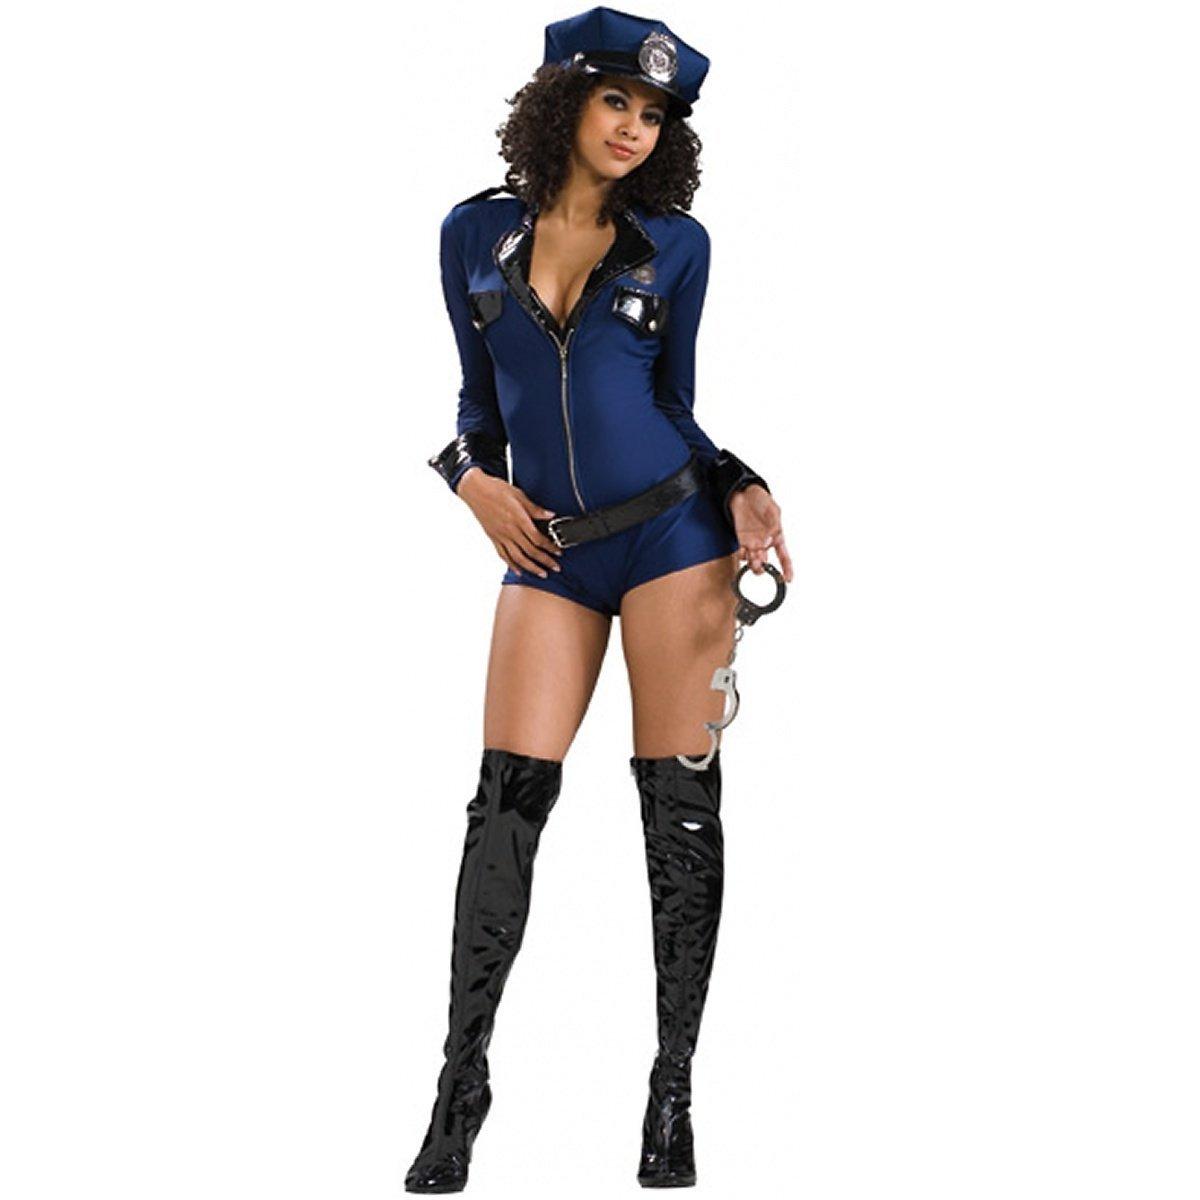 Secret Wishes Sexy Miss Demeanor Costume, Navy Blue, Medium